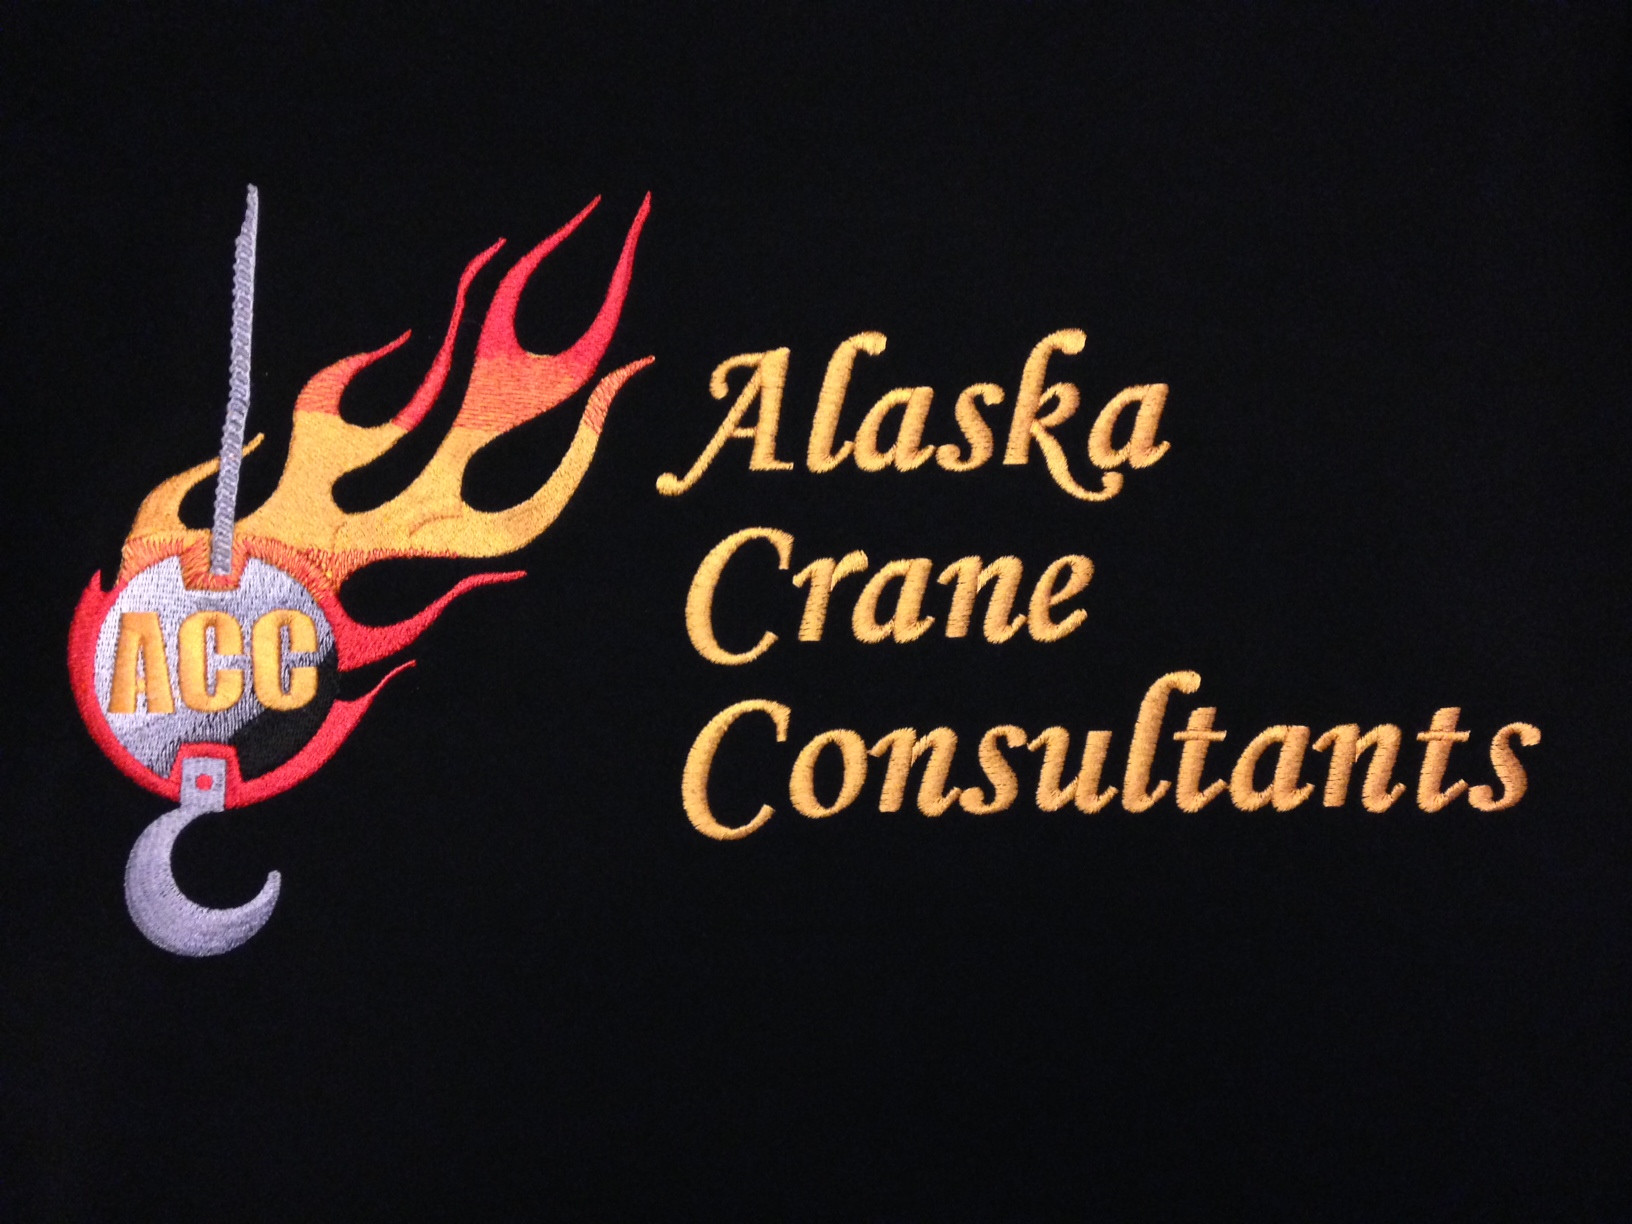 alaska crane consultants  crane training  nccco  Alaska